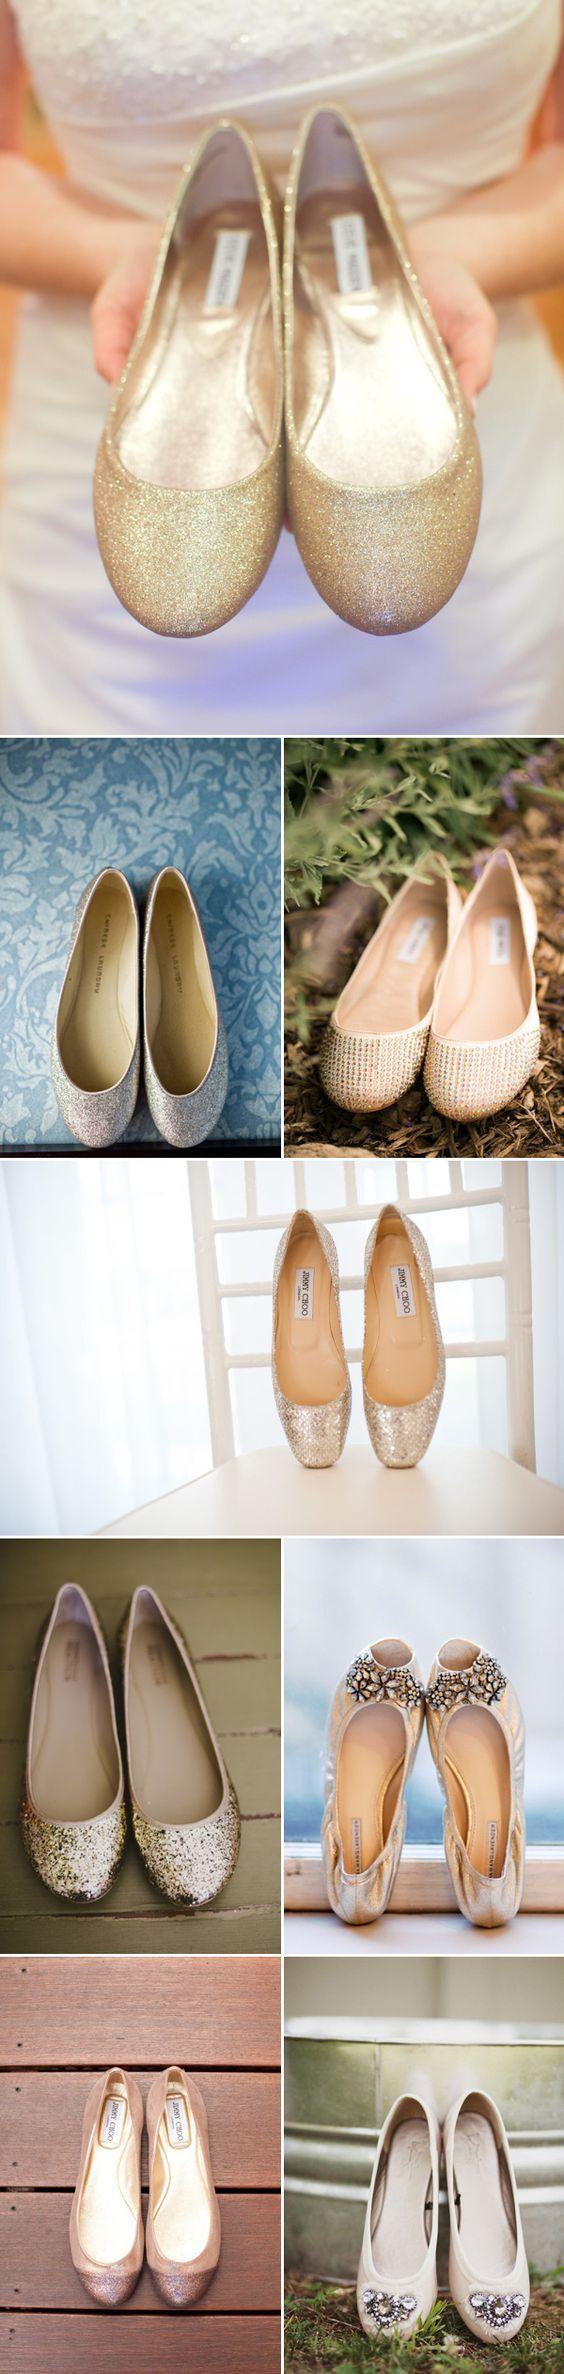 Ballerinas para novias 6